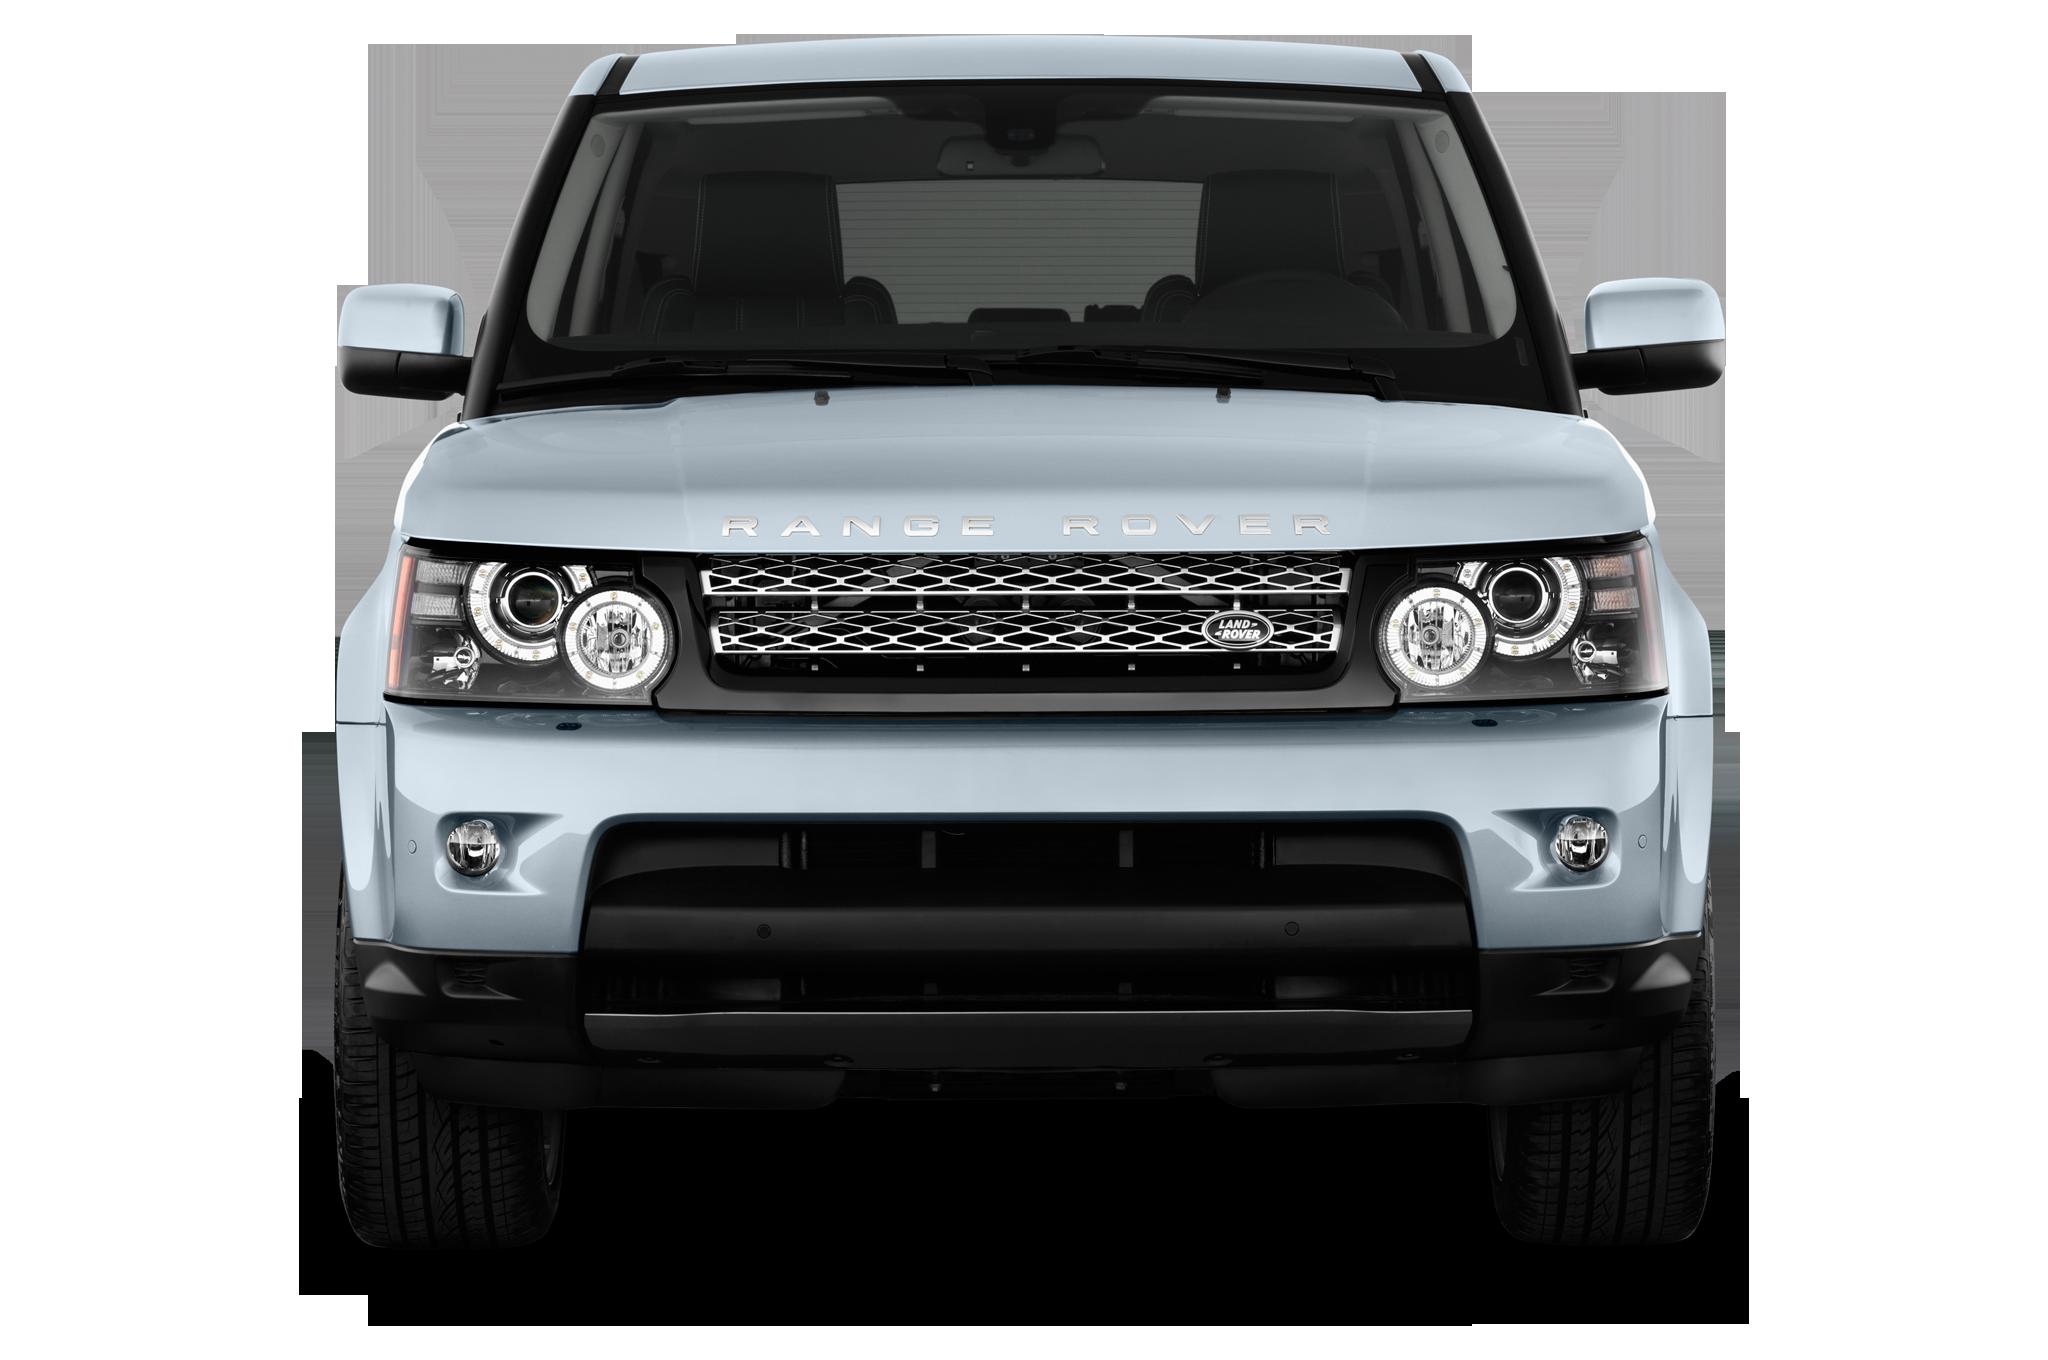 Technicolor Power Overfinch Upgrades Range Rover Sport